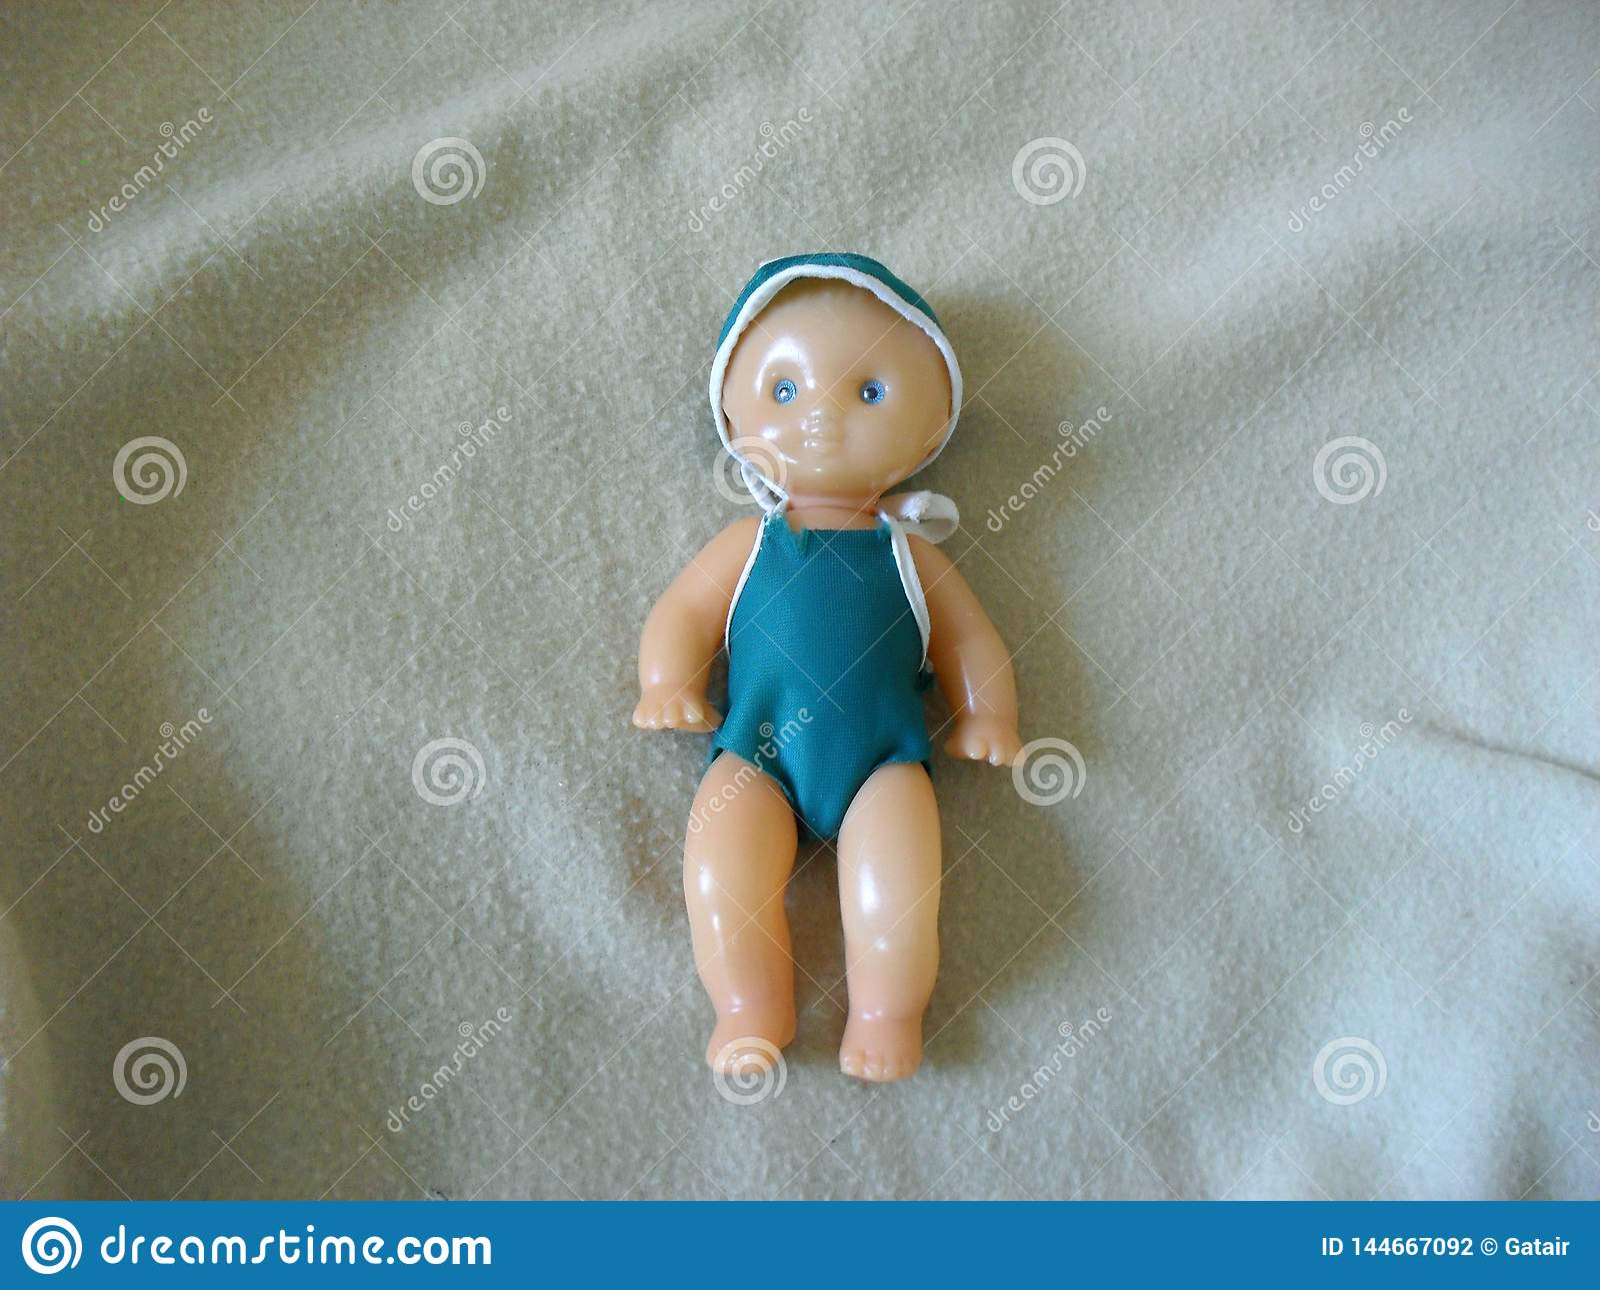 Vintage doll baby Vertical